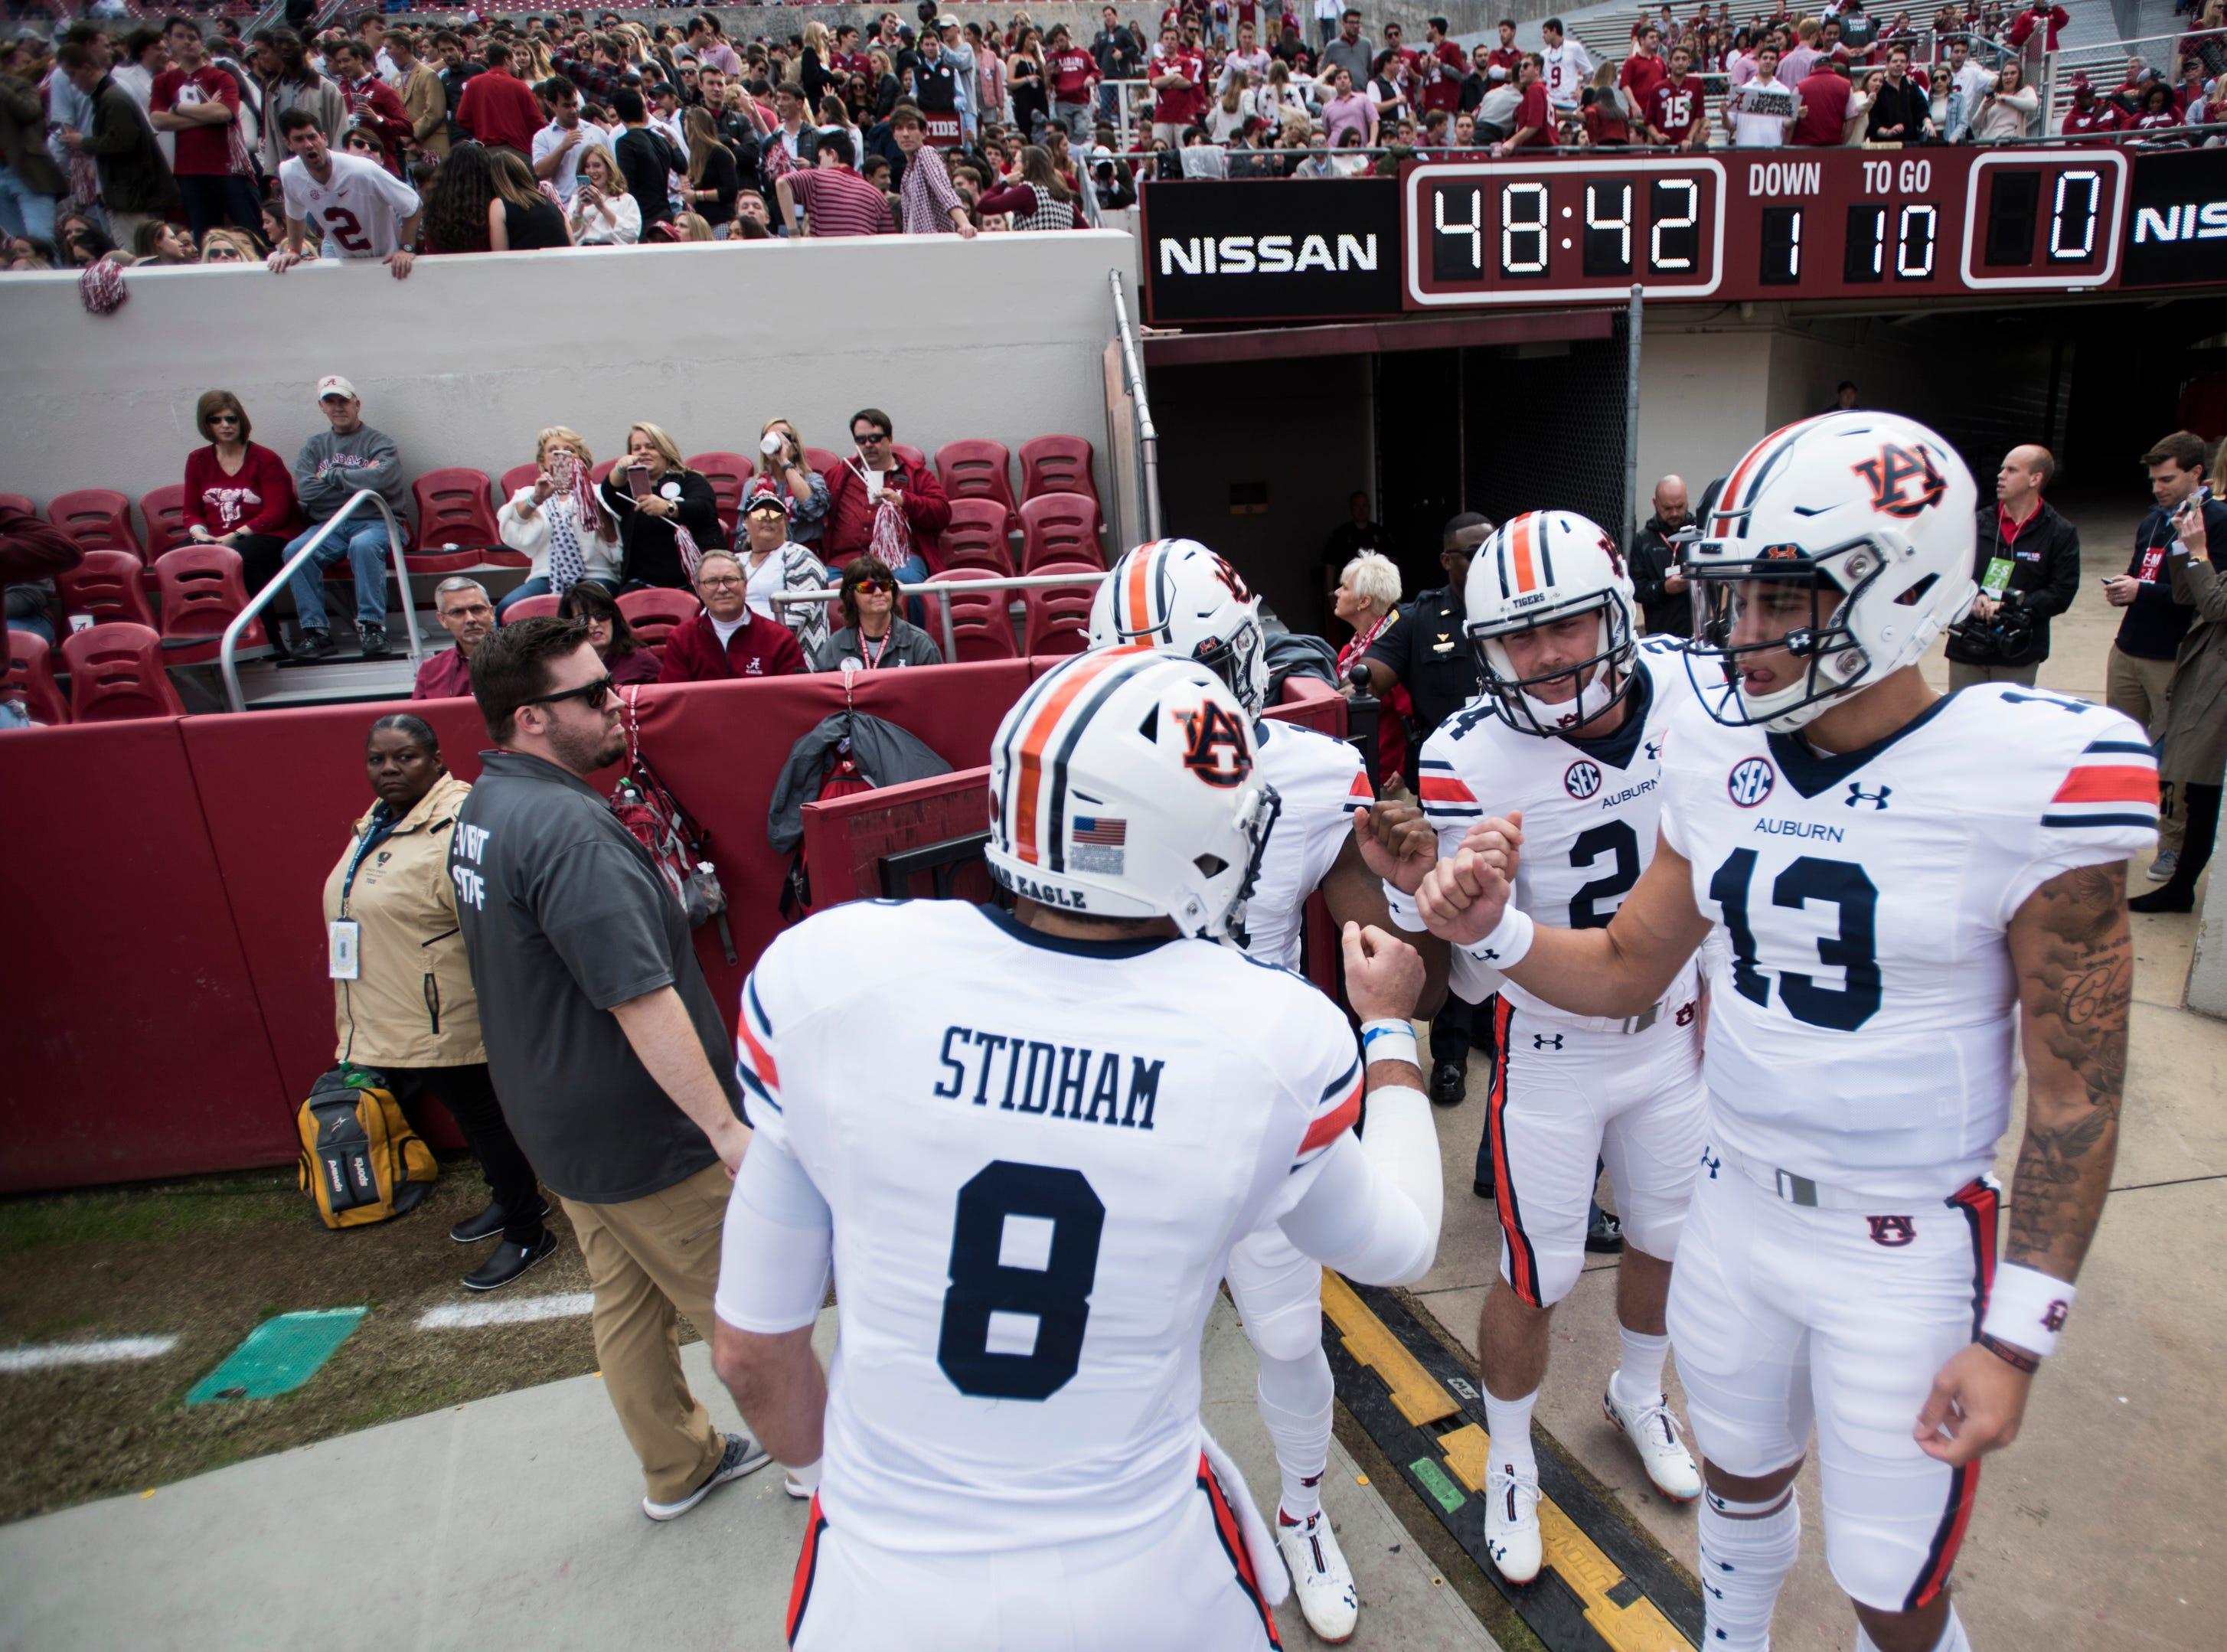 Auburn quarterback Jarrett Stidham (8) leads the quarterbacks onto the field for warm ups before the Iron Bowl at Bryant-Denny Stadium in Tuscaloosa, Ala., on Saturday, Nov. 24, 2018.